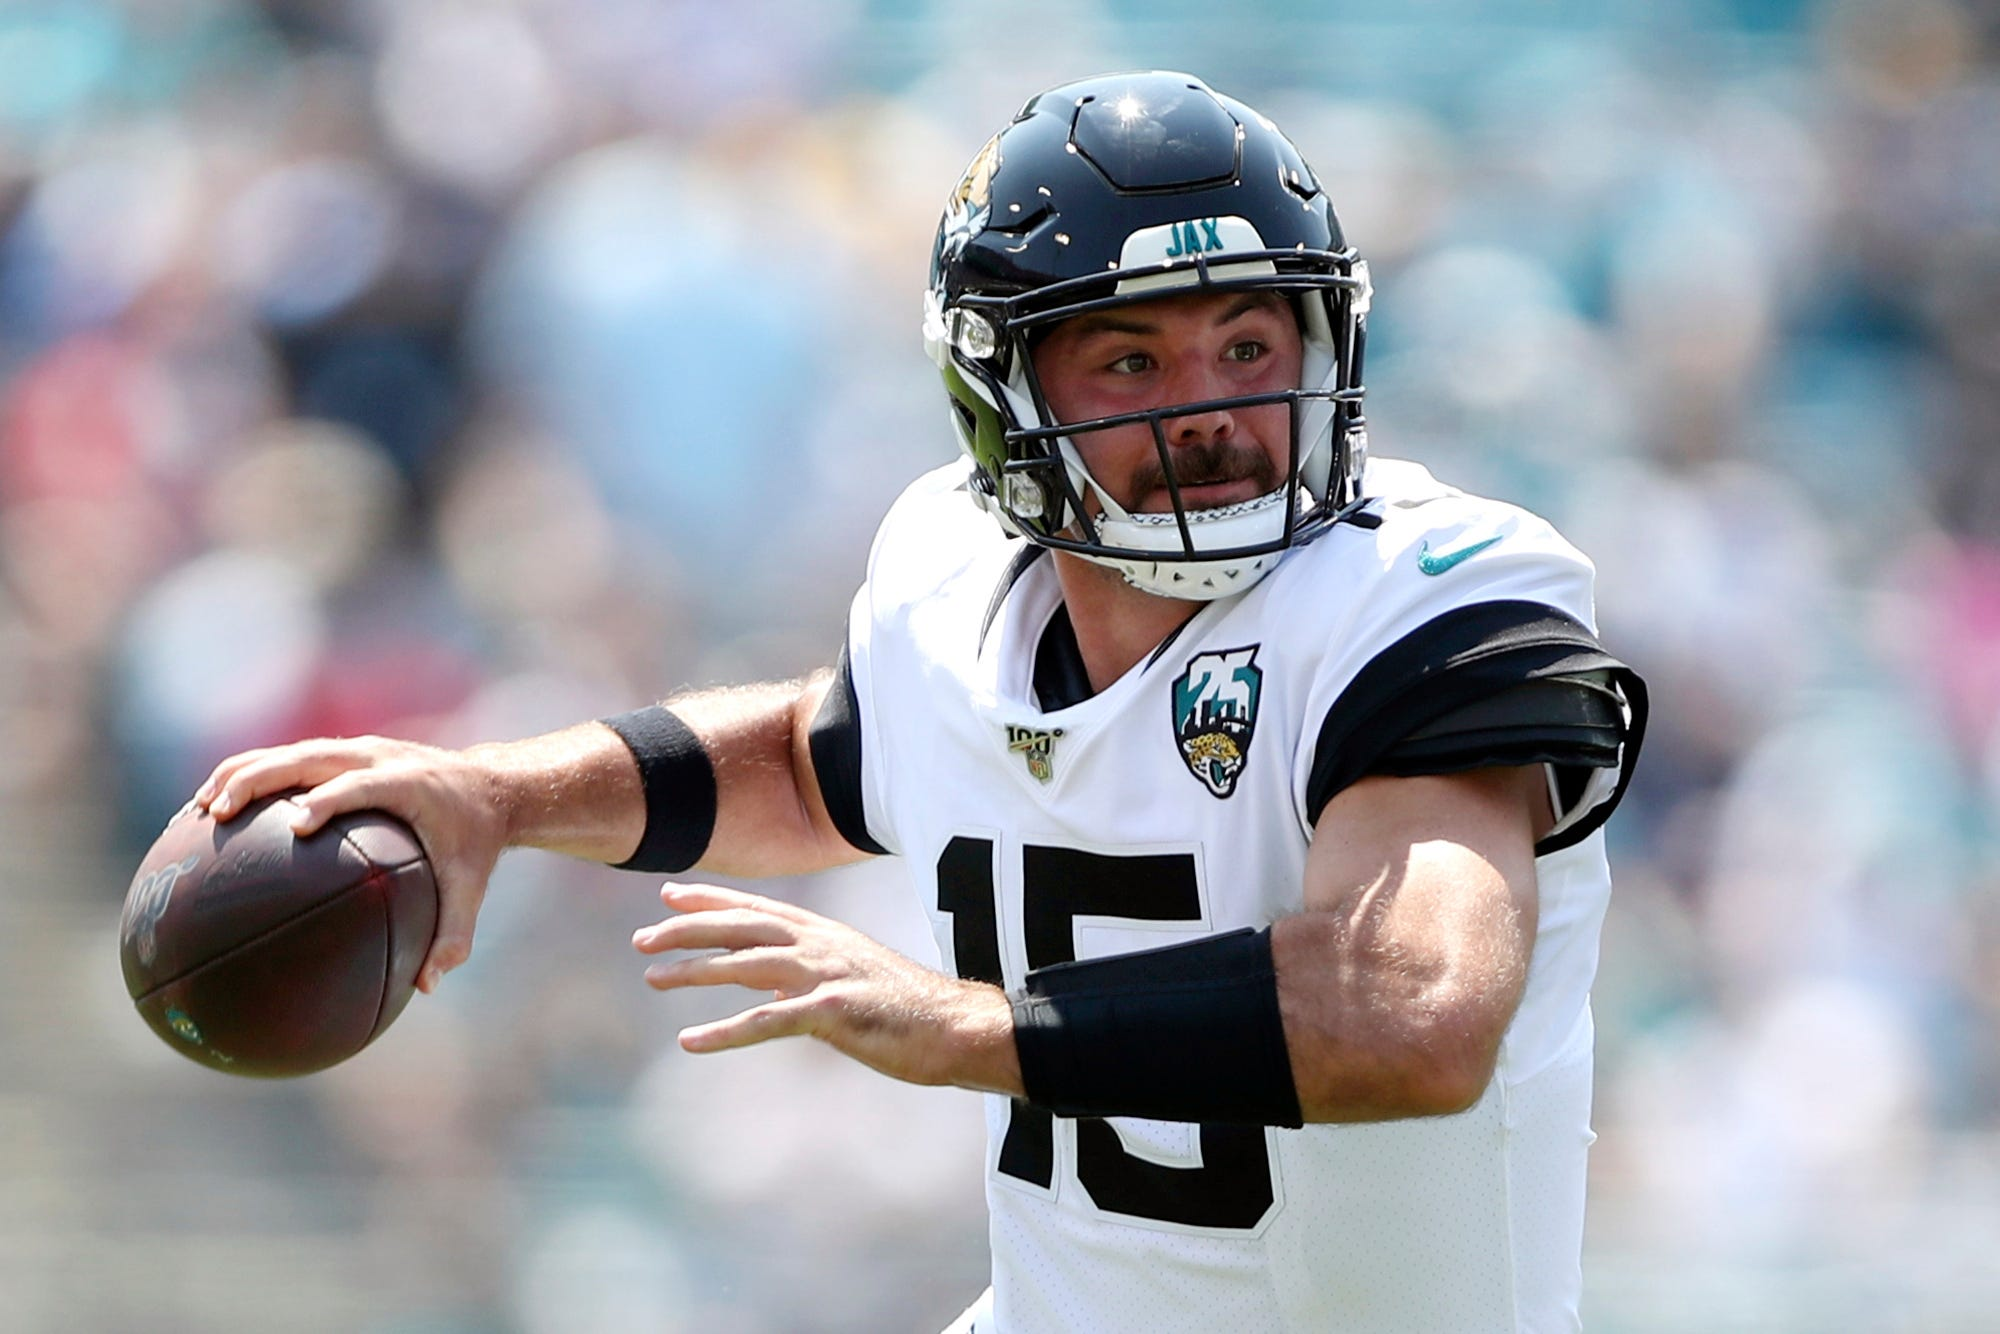 Jaguars QB Minshew prepares for 1st NFL start against Texans